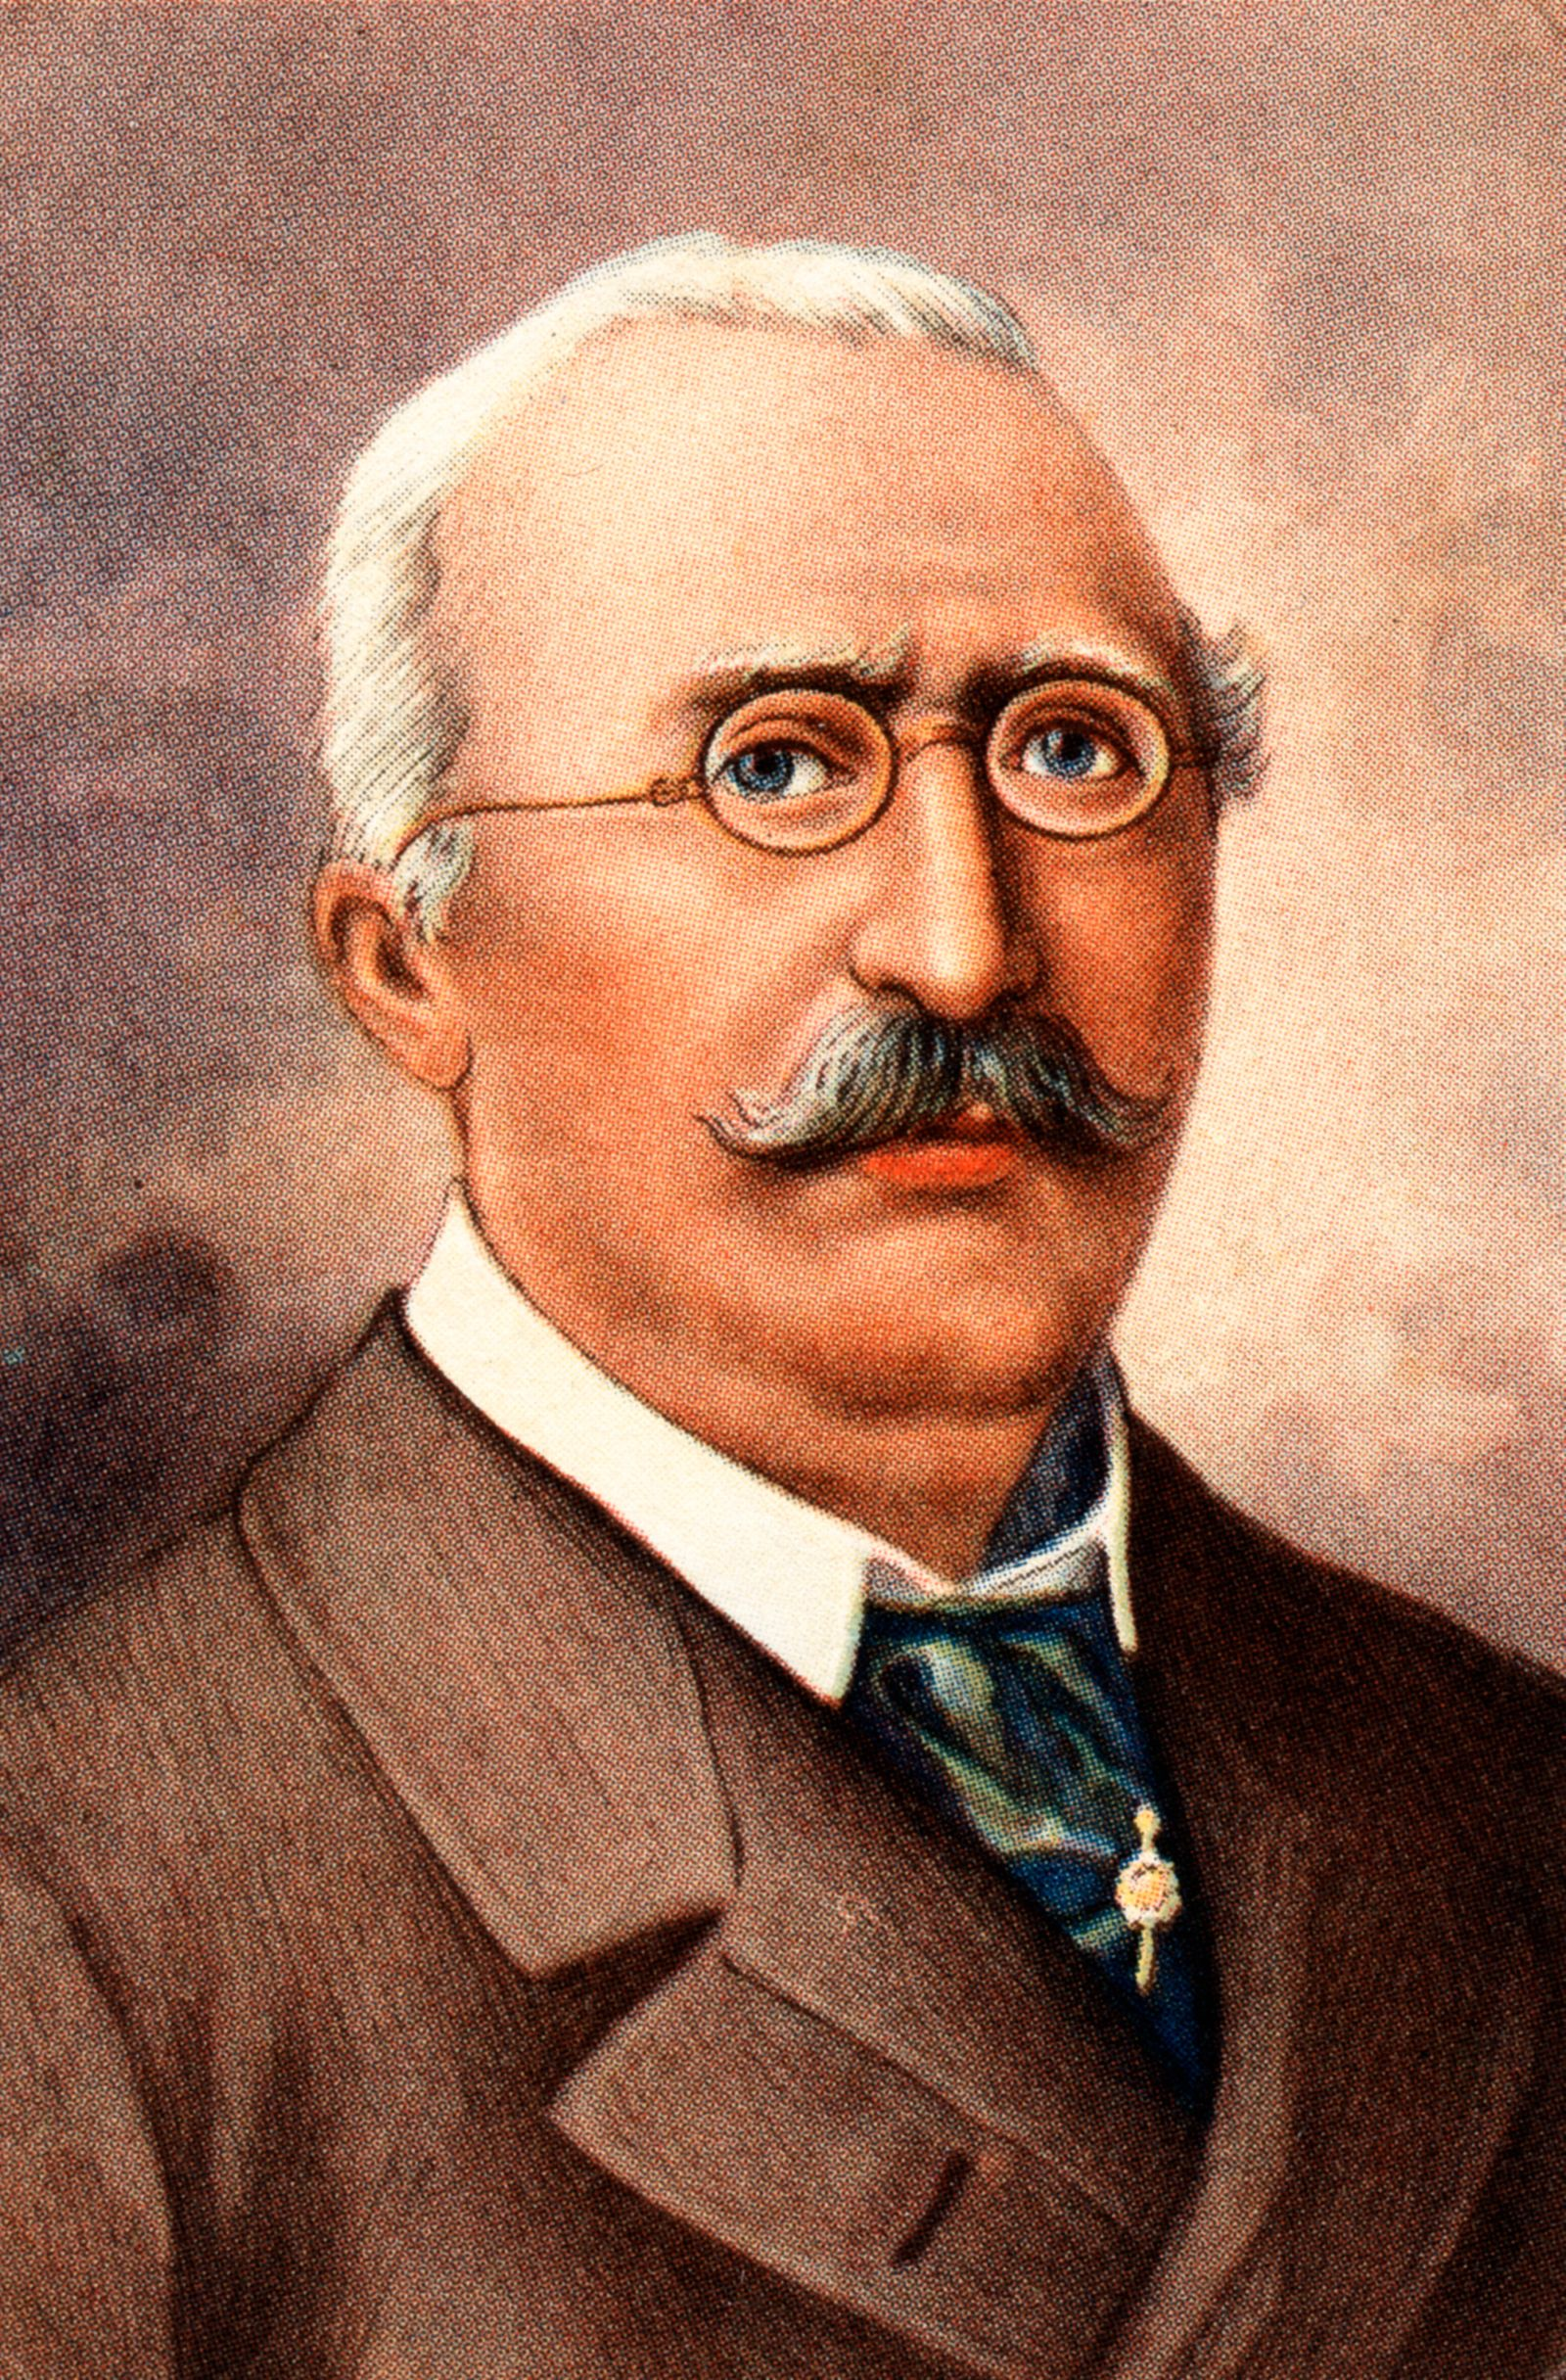 Friedrich Alfred Krupp (1854-1902), German steel manufacturer of the company Krupp, born in Essen (Germany).